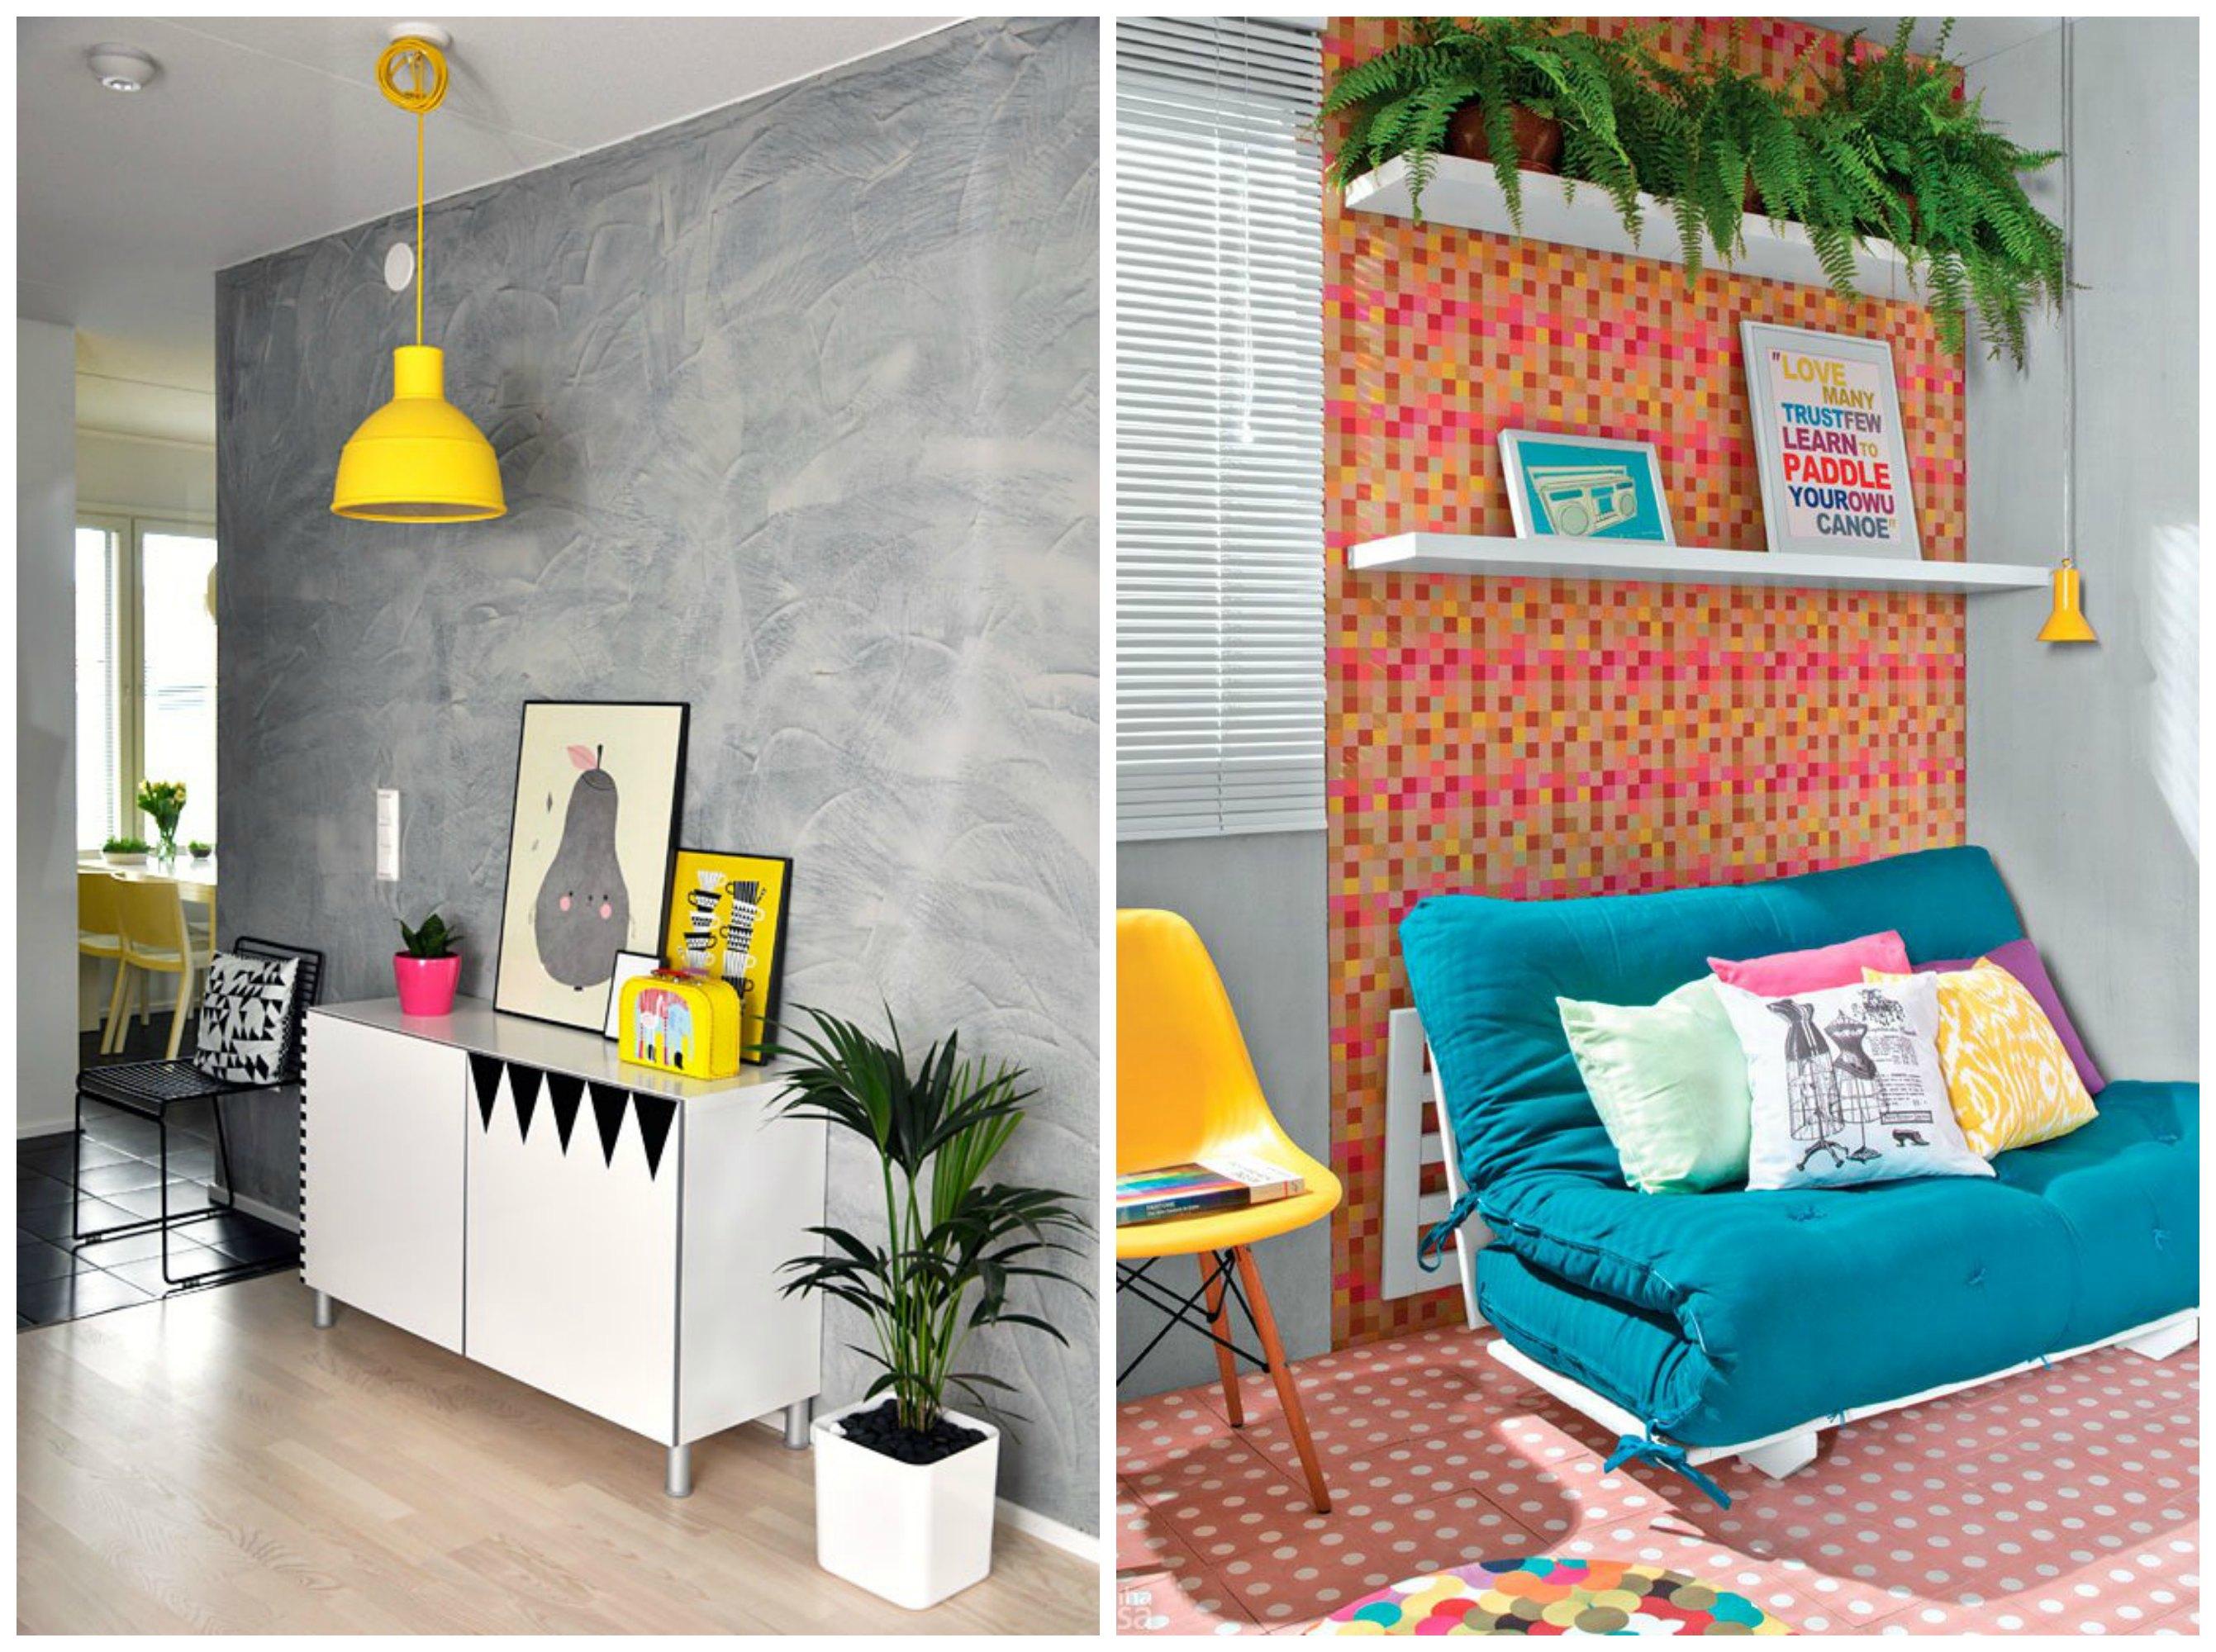 Decoracao Para Sala Simples Decorao Marrom De Sala Simples  -> Decoracao De Sala De Estar Pequena E Barata